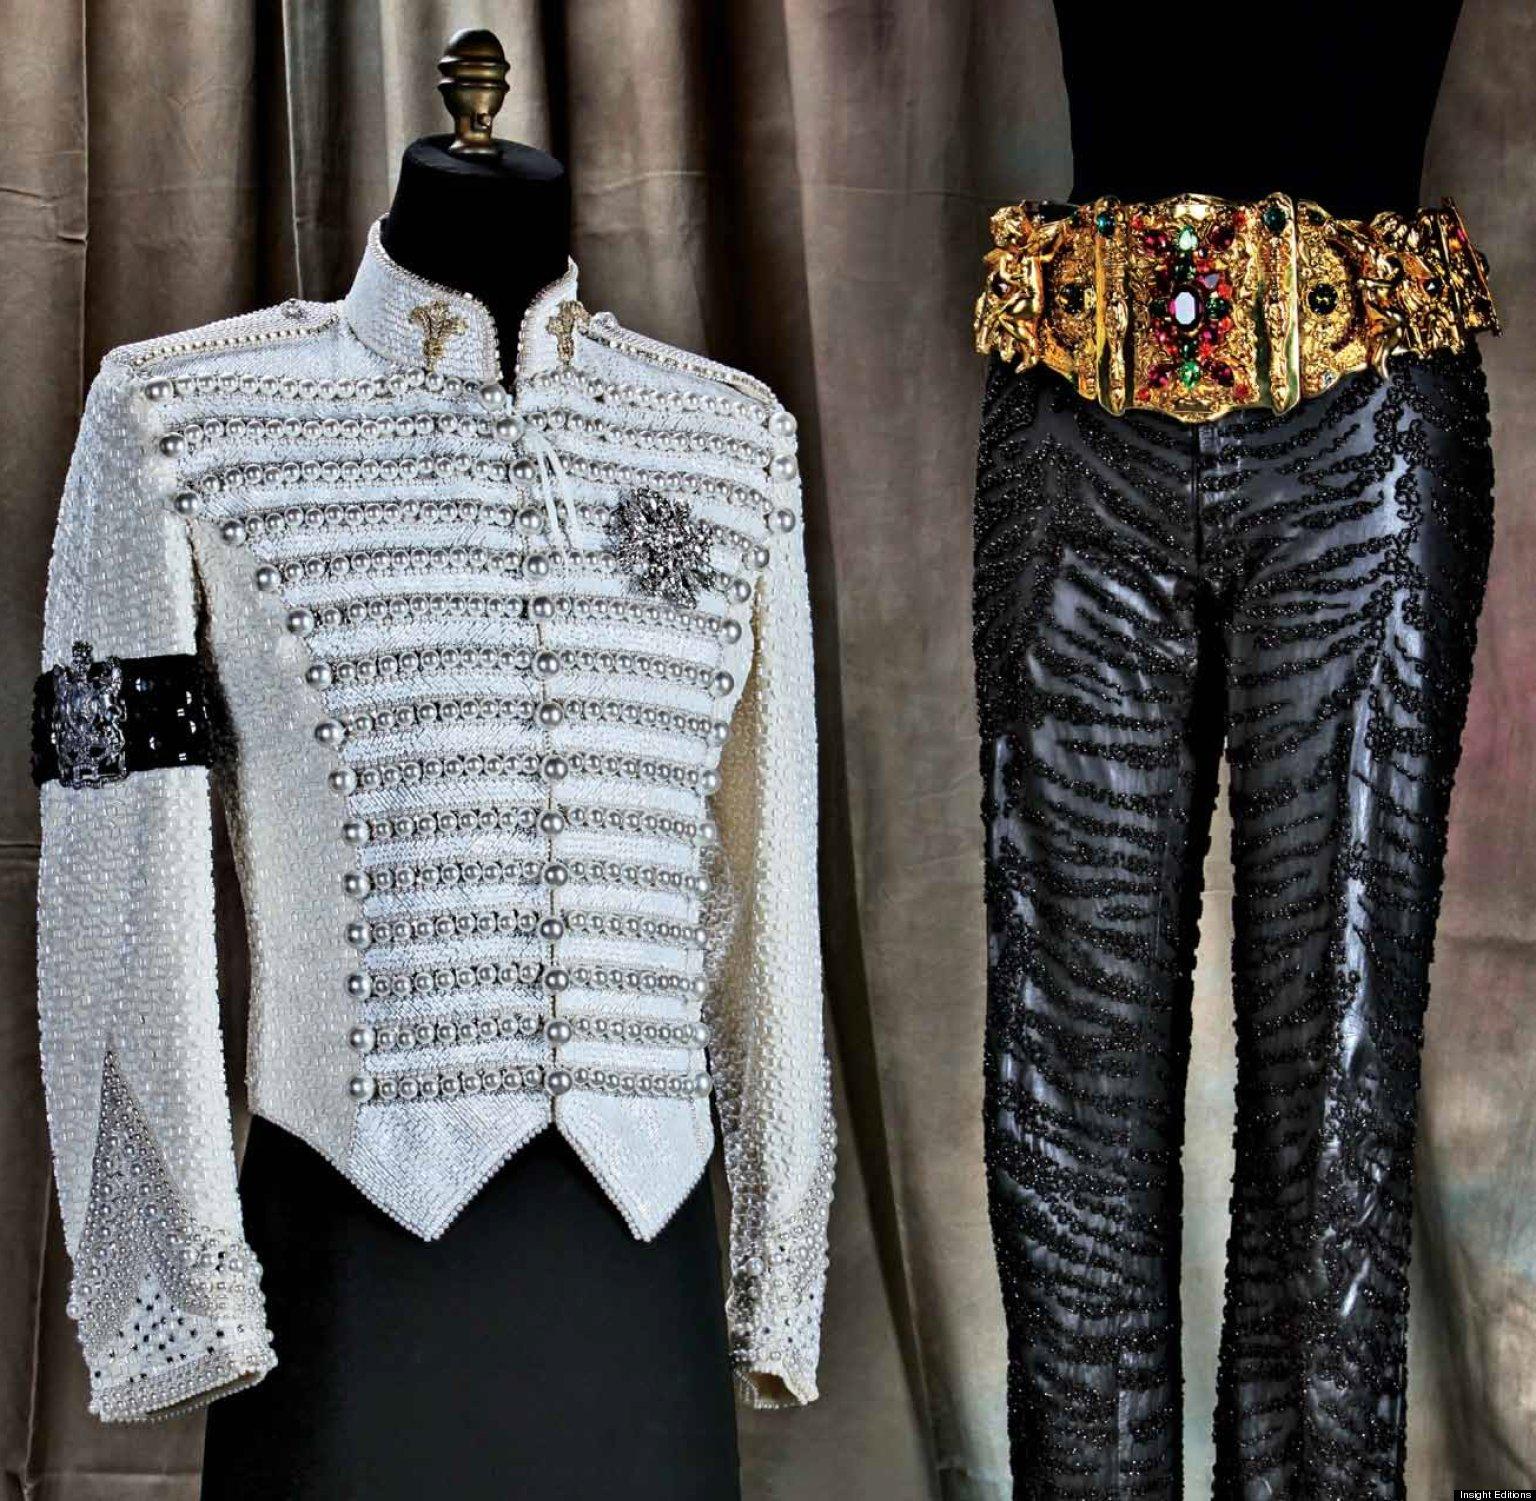 Madonna Tour Merchandise